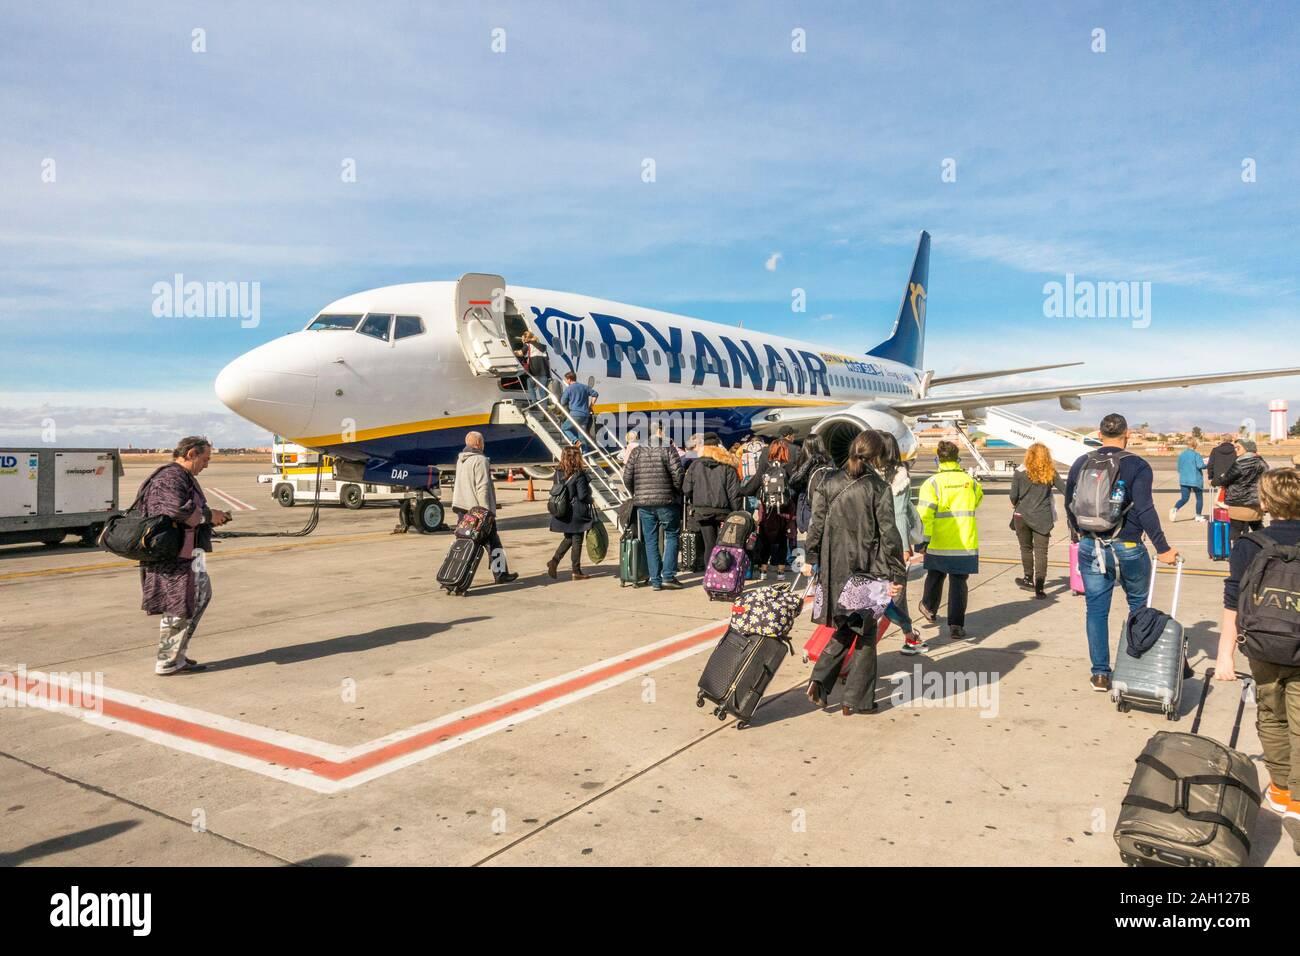 Passengers boarding Ryanair aircraft, Airport Marrakesh, Morocco. Stock Photo